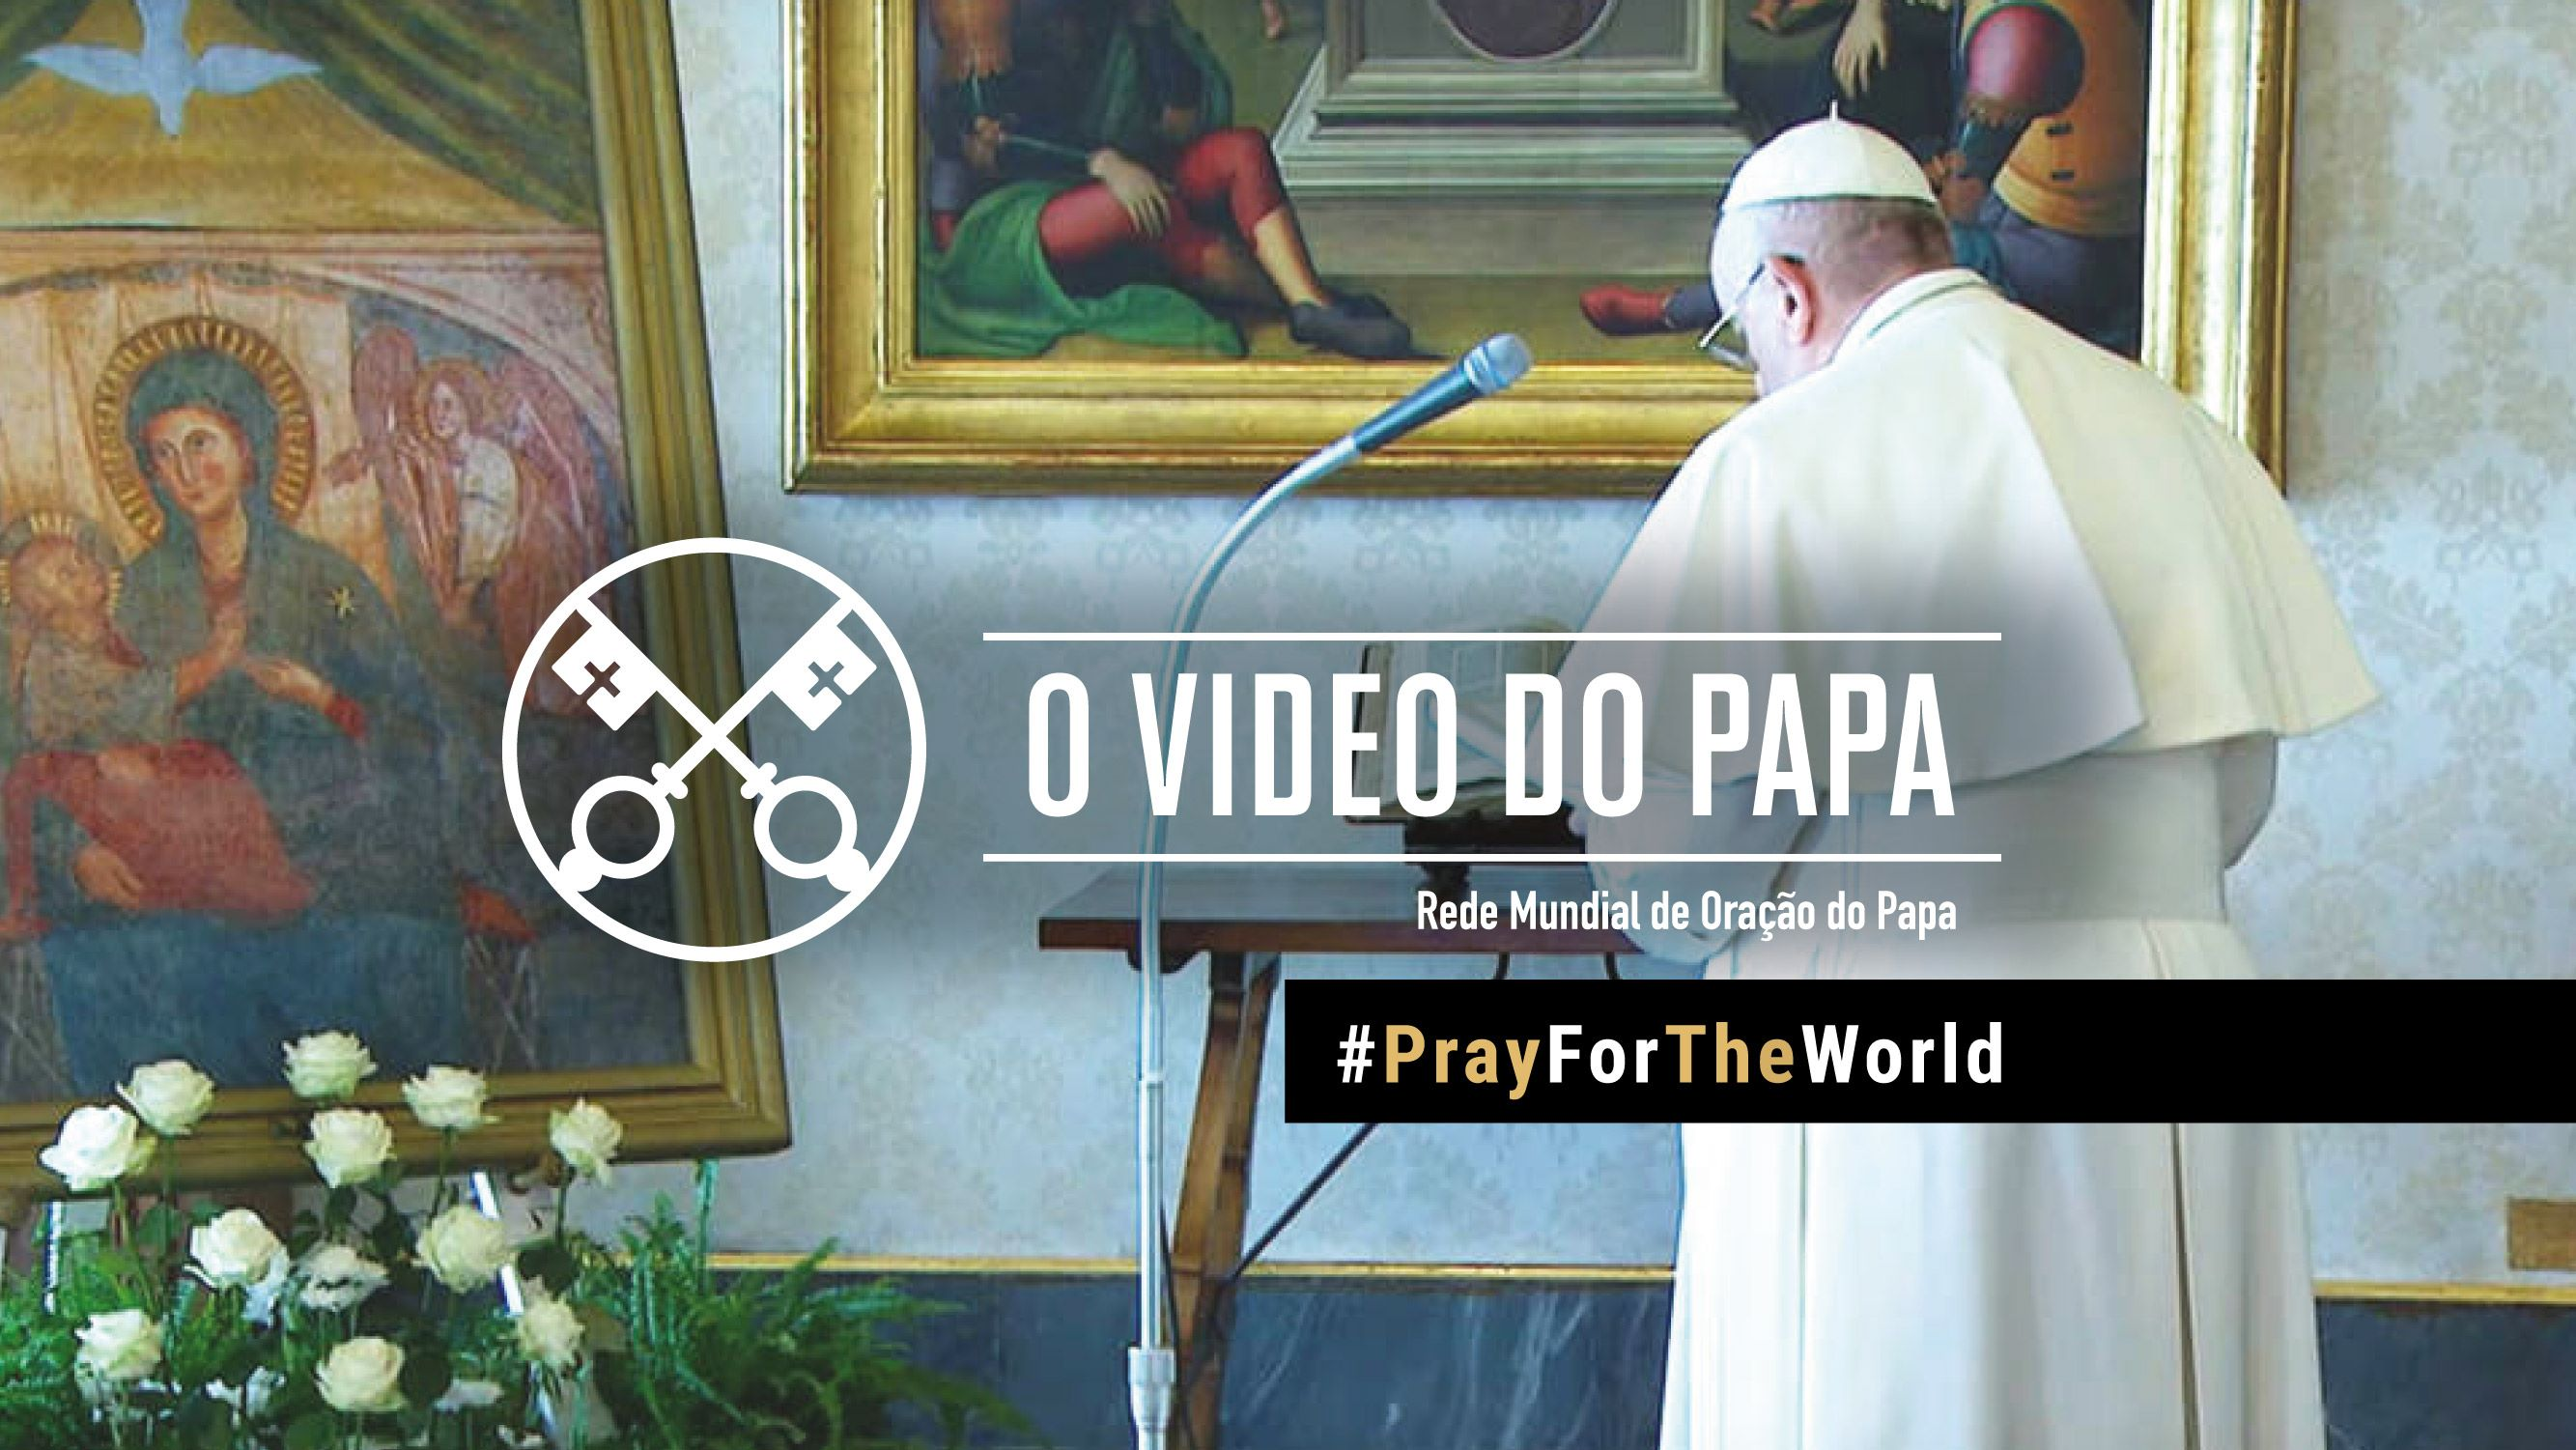 Official Image - TPV PFTW 2020 PT - O Video do Papa - #PrayForTheWorld